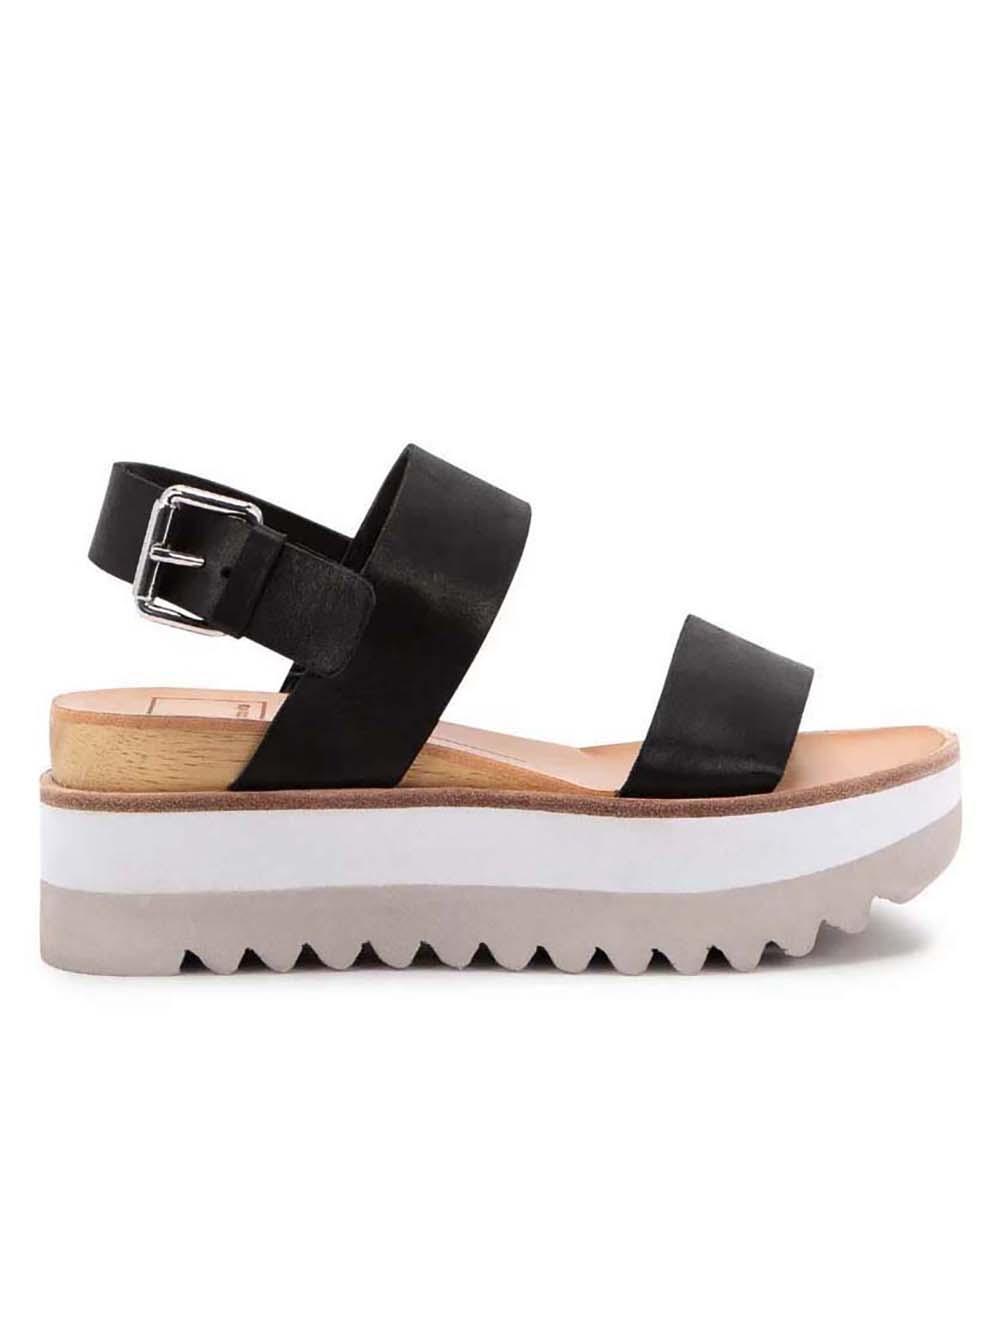 Moxie Platform Slingback Sandal Item # MOXIE